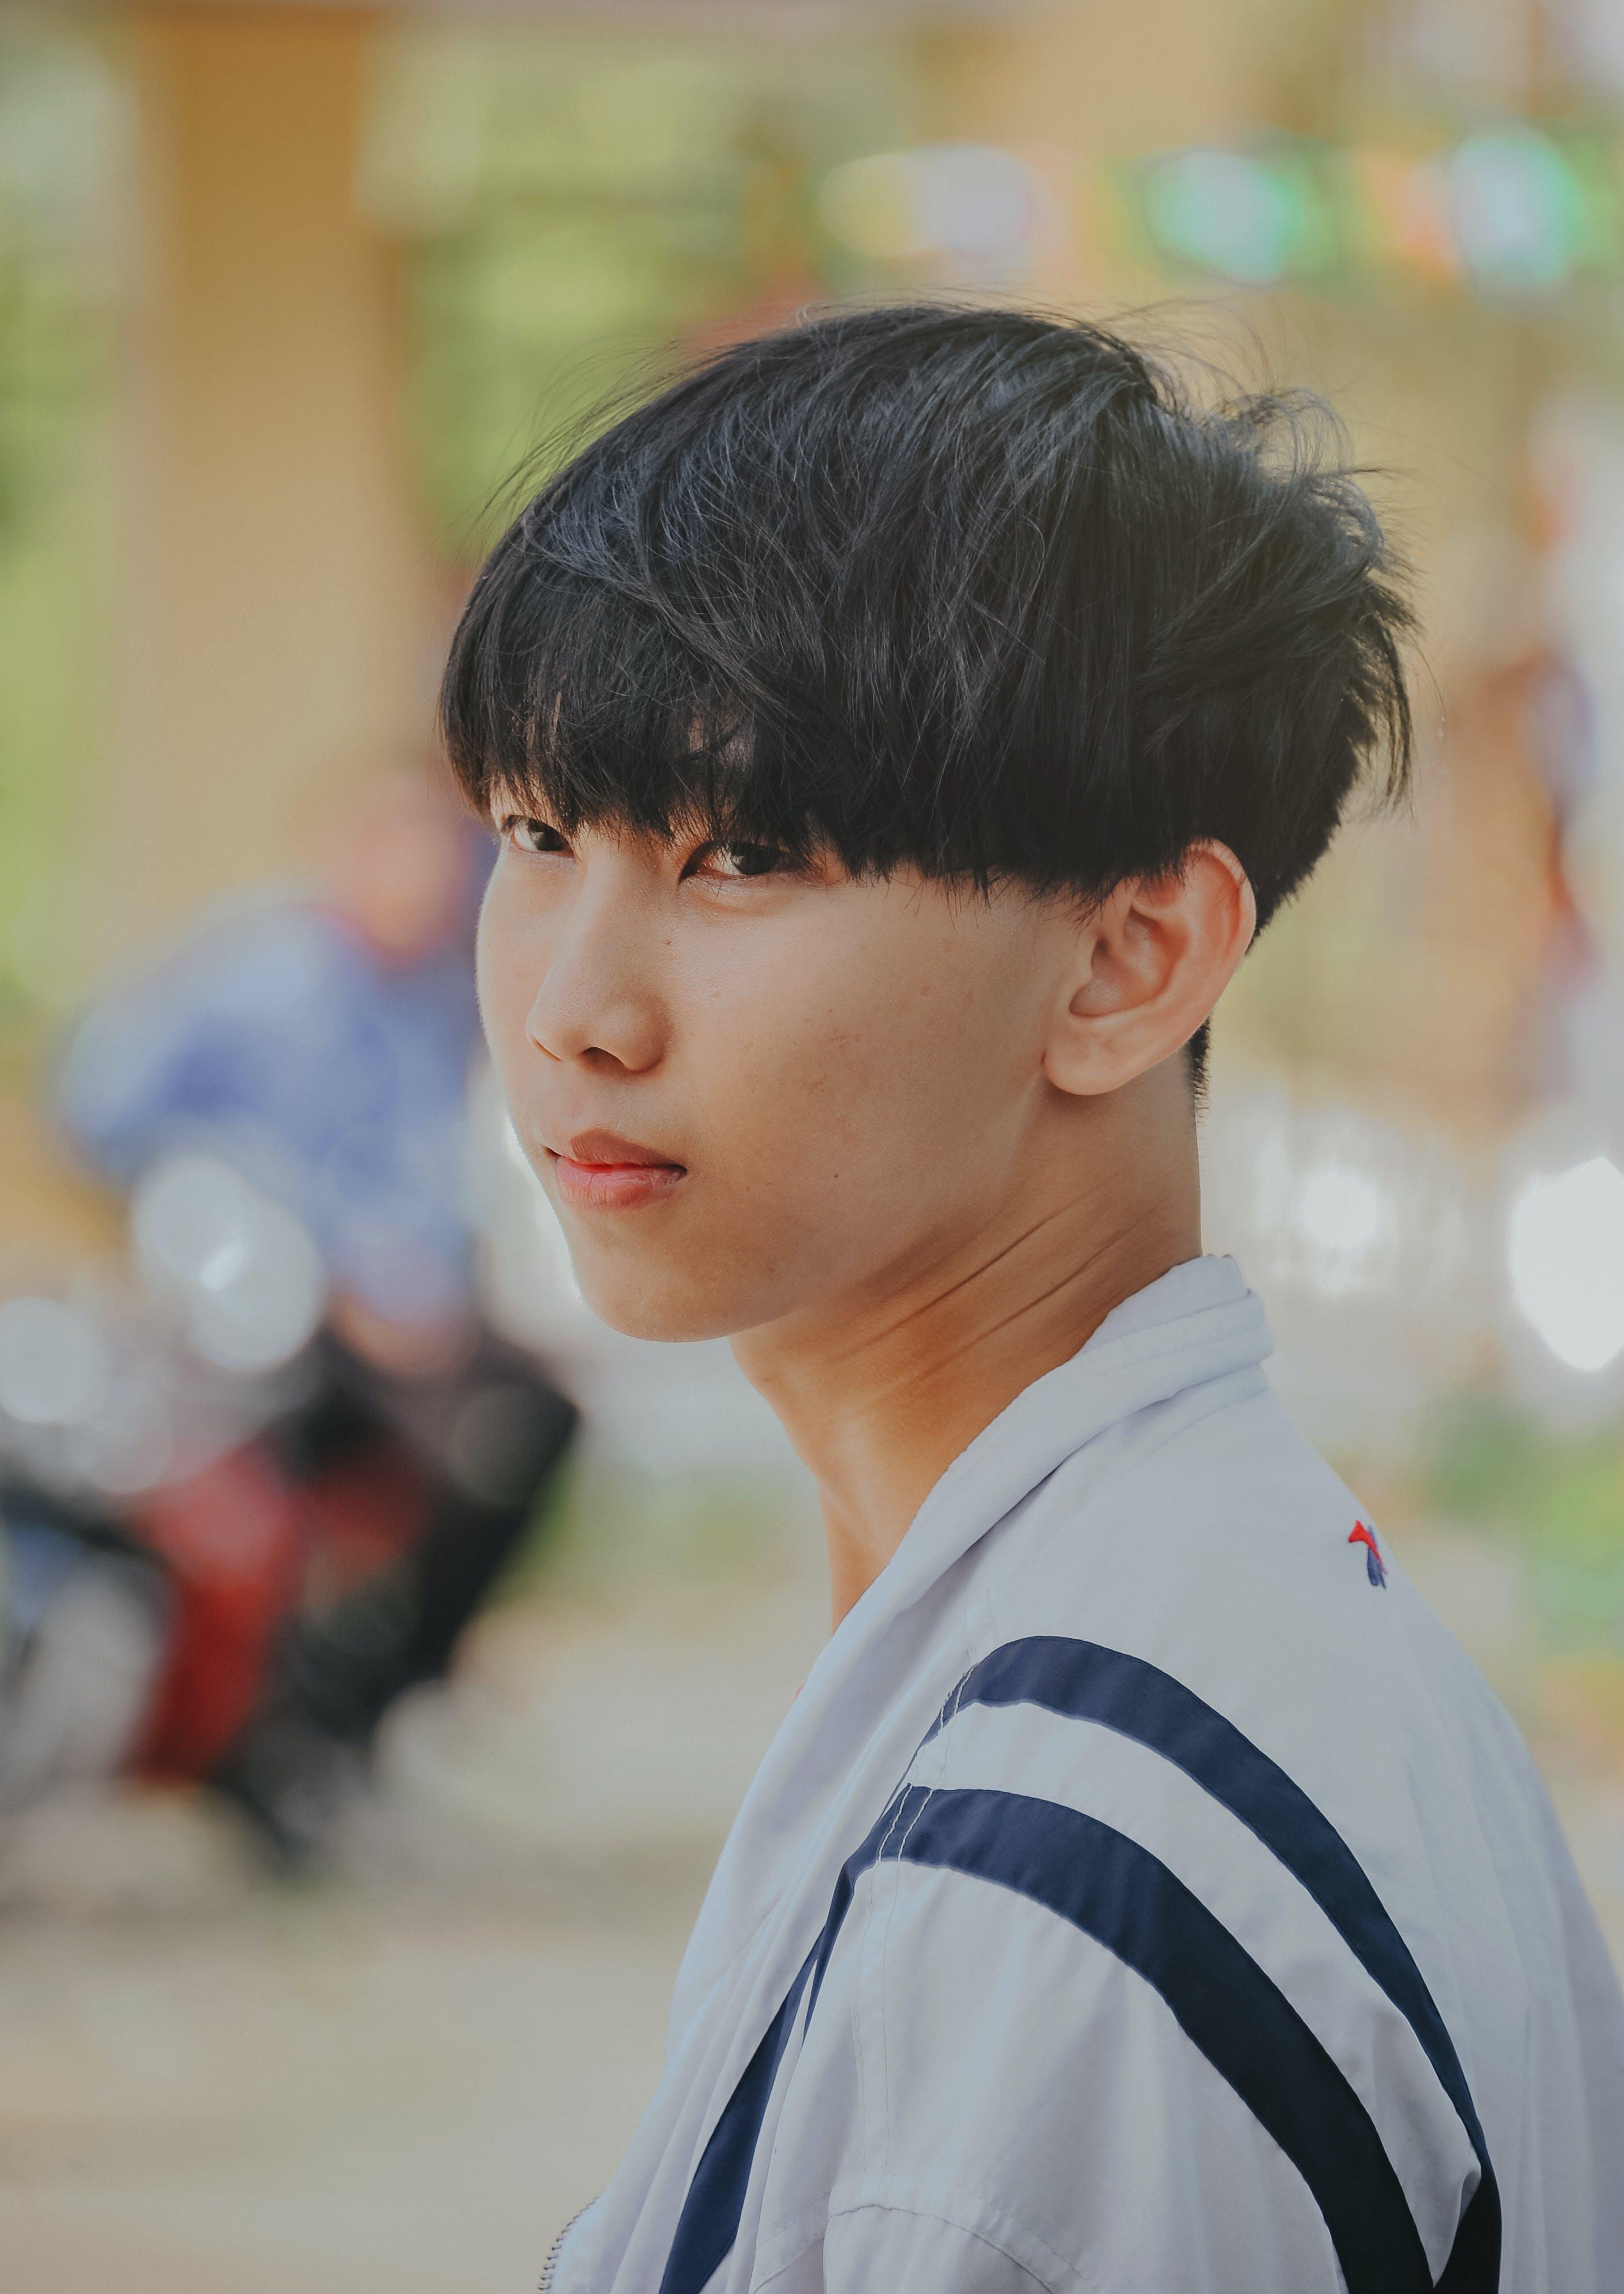 Asian guy, asian man, boy